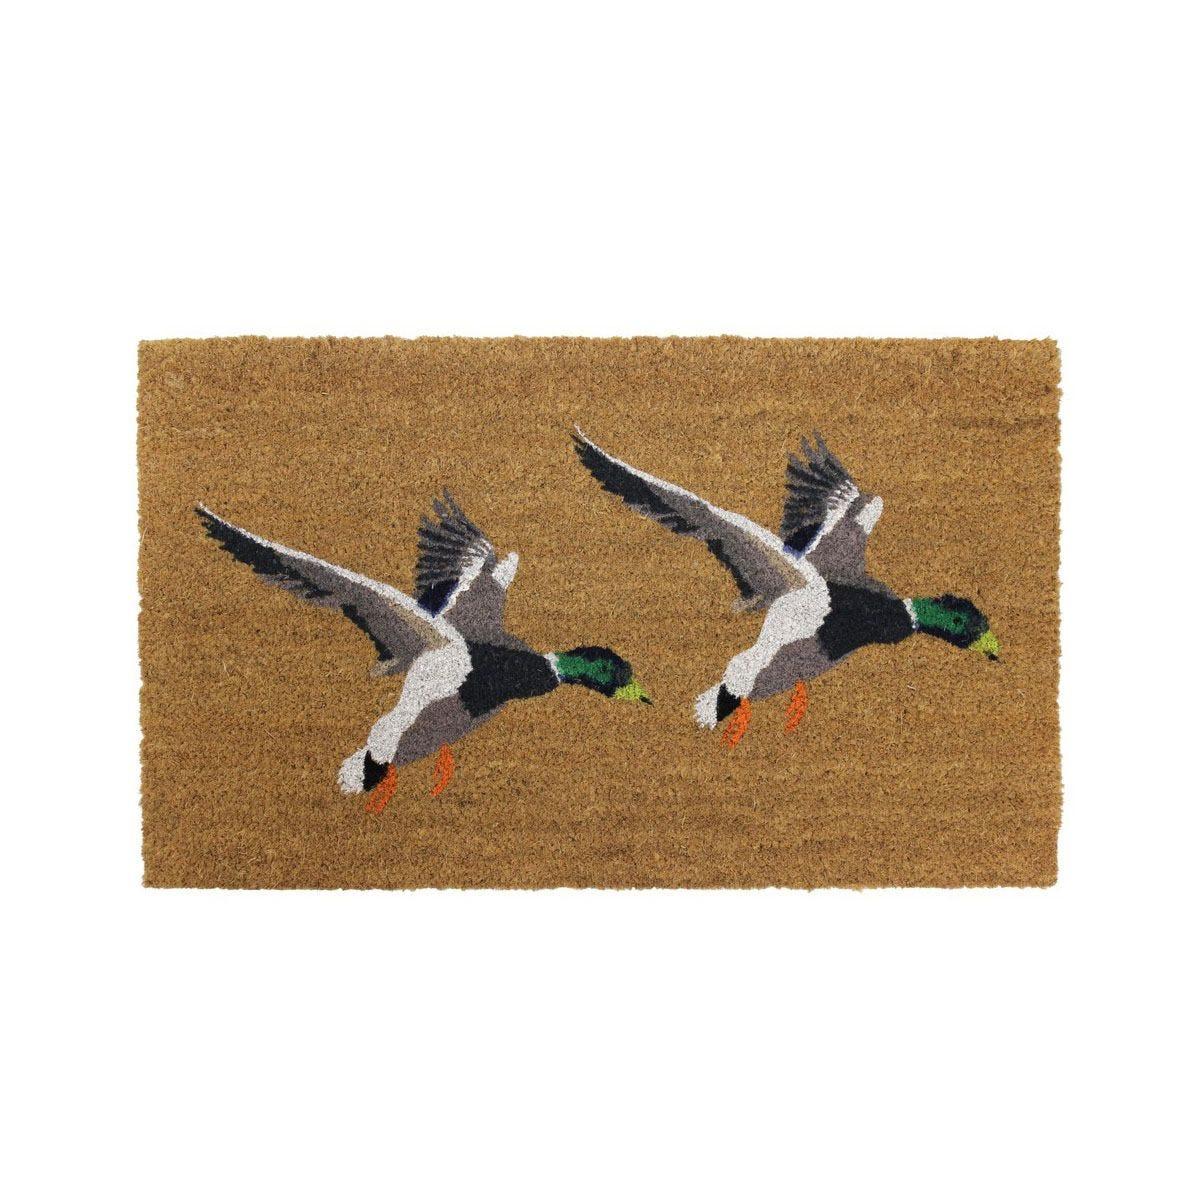 JVL Country 45 x 75cm Latex Backed Coir Entrance Door Mat - Ducks